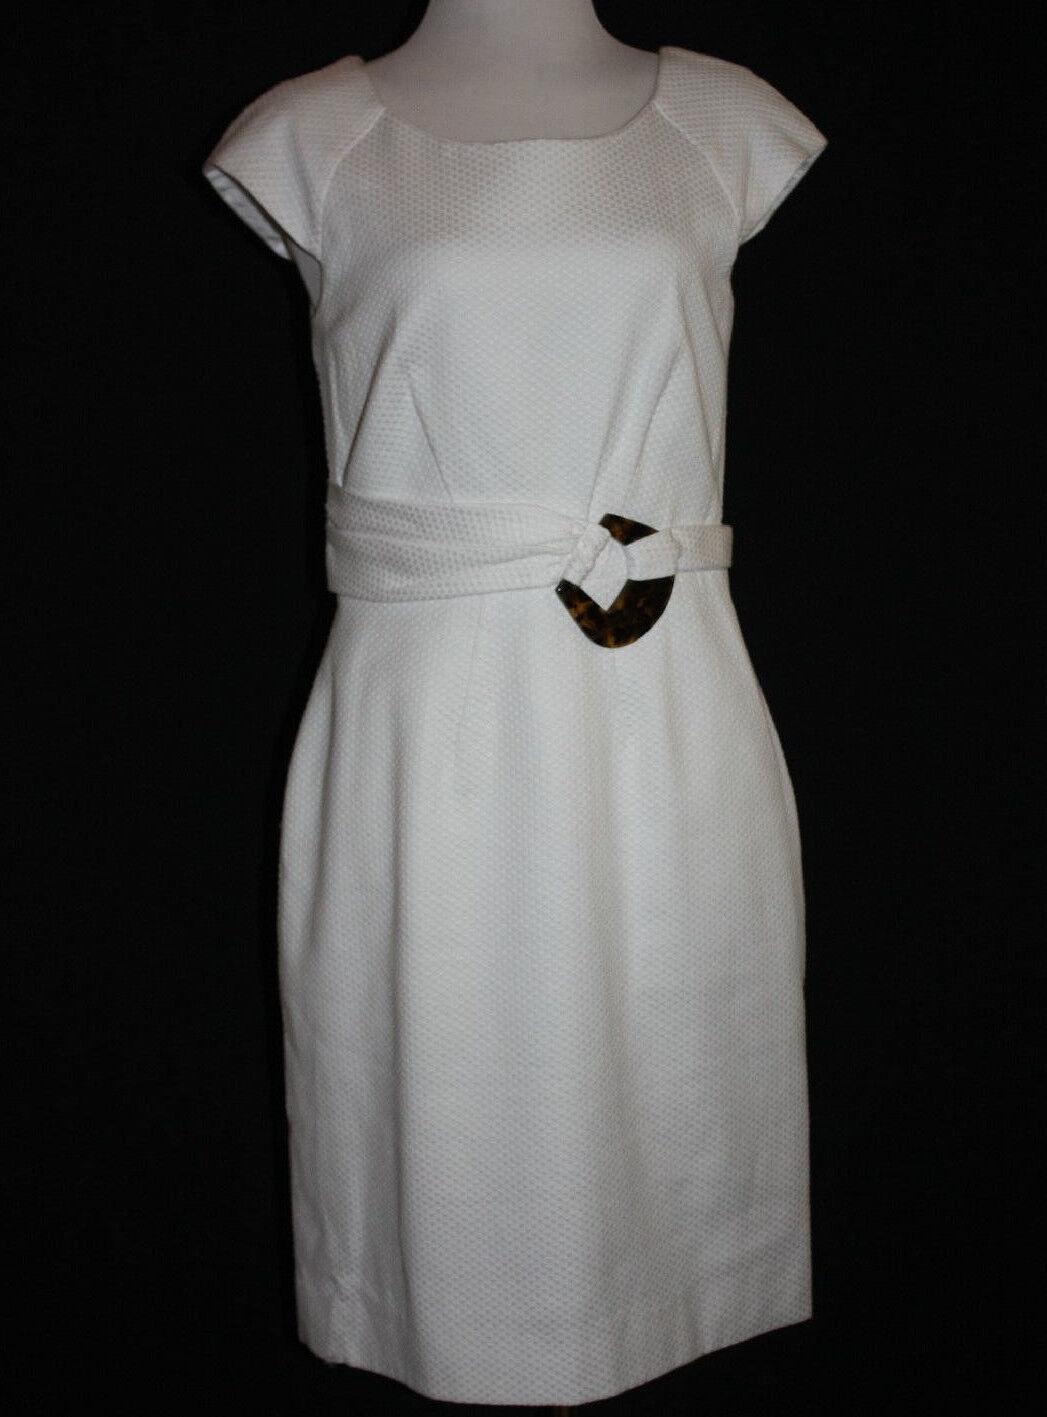 ..BIGIO COLLECTION Women's White Cotton Stretch Lined Cap Sleeve Dress Sz 8